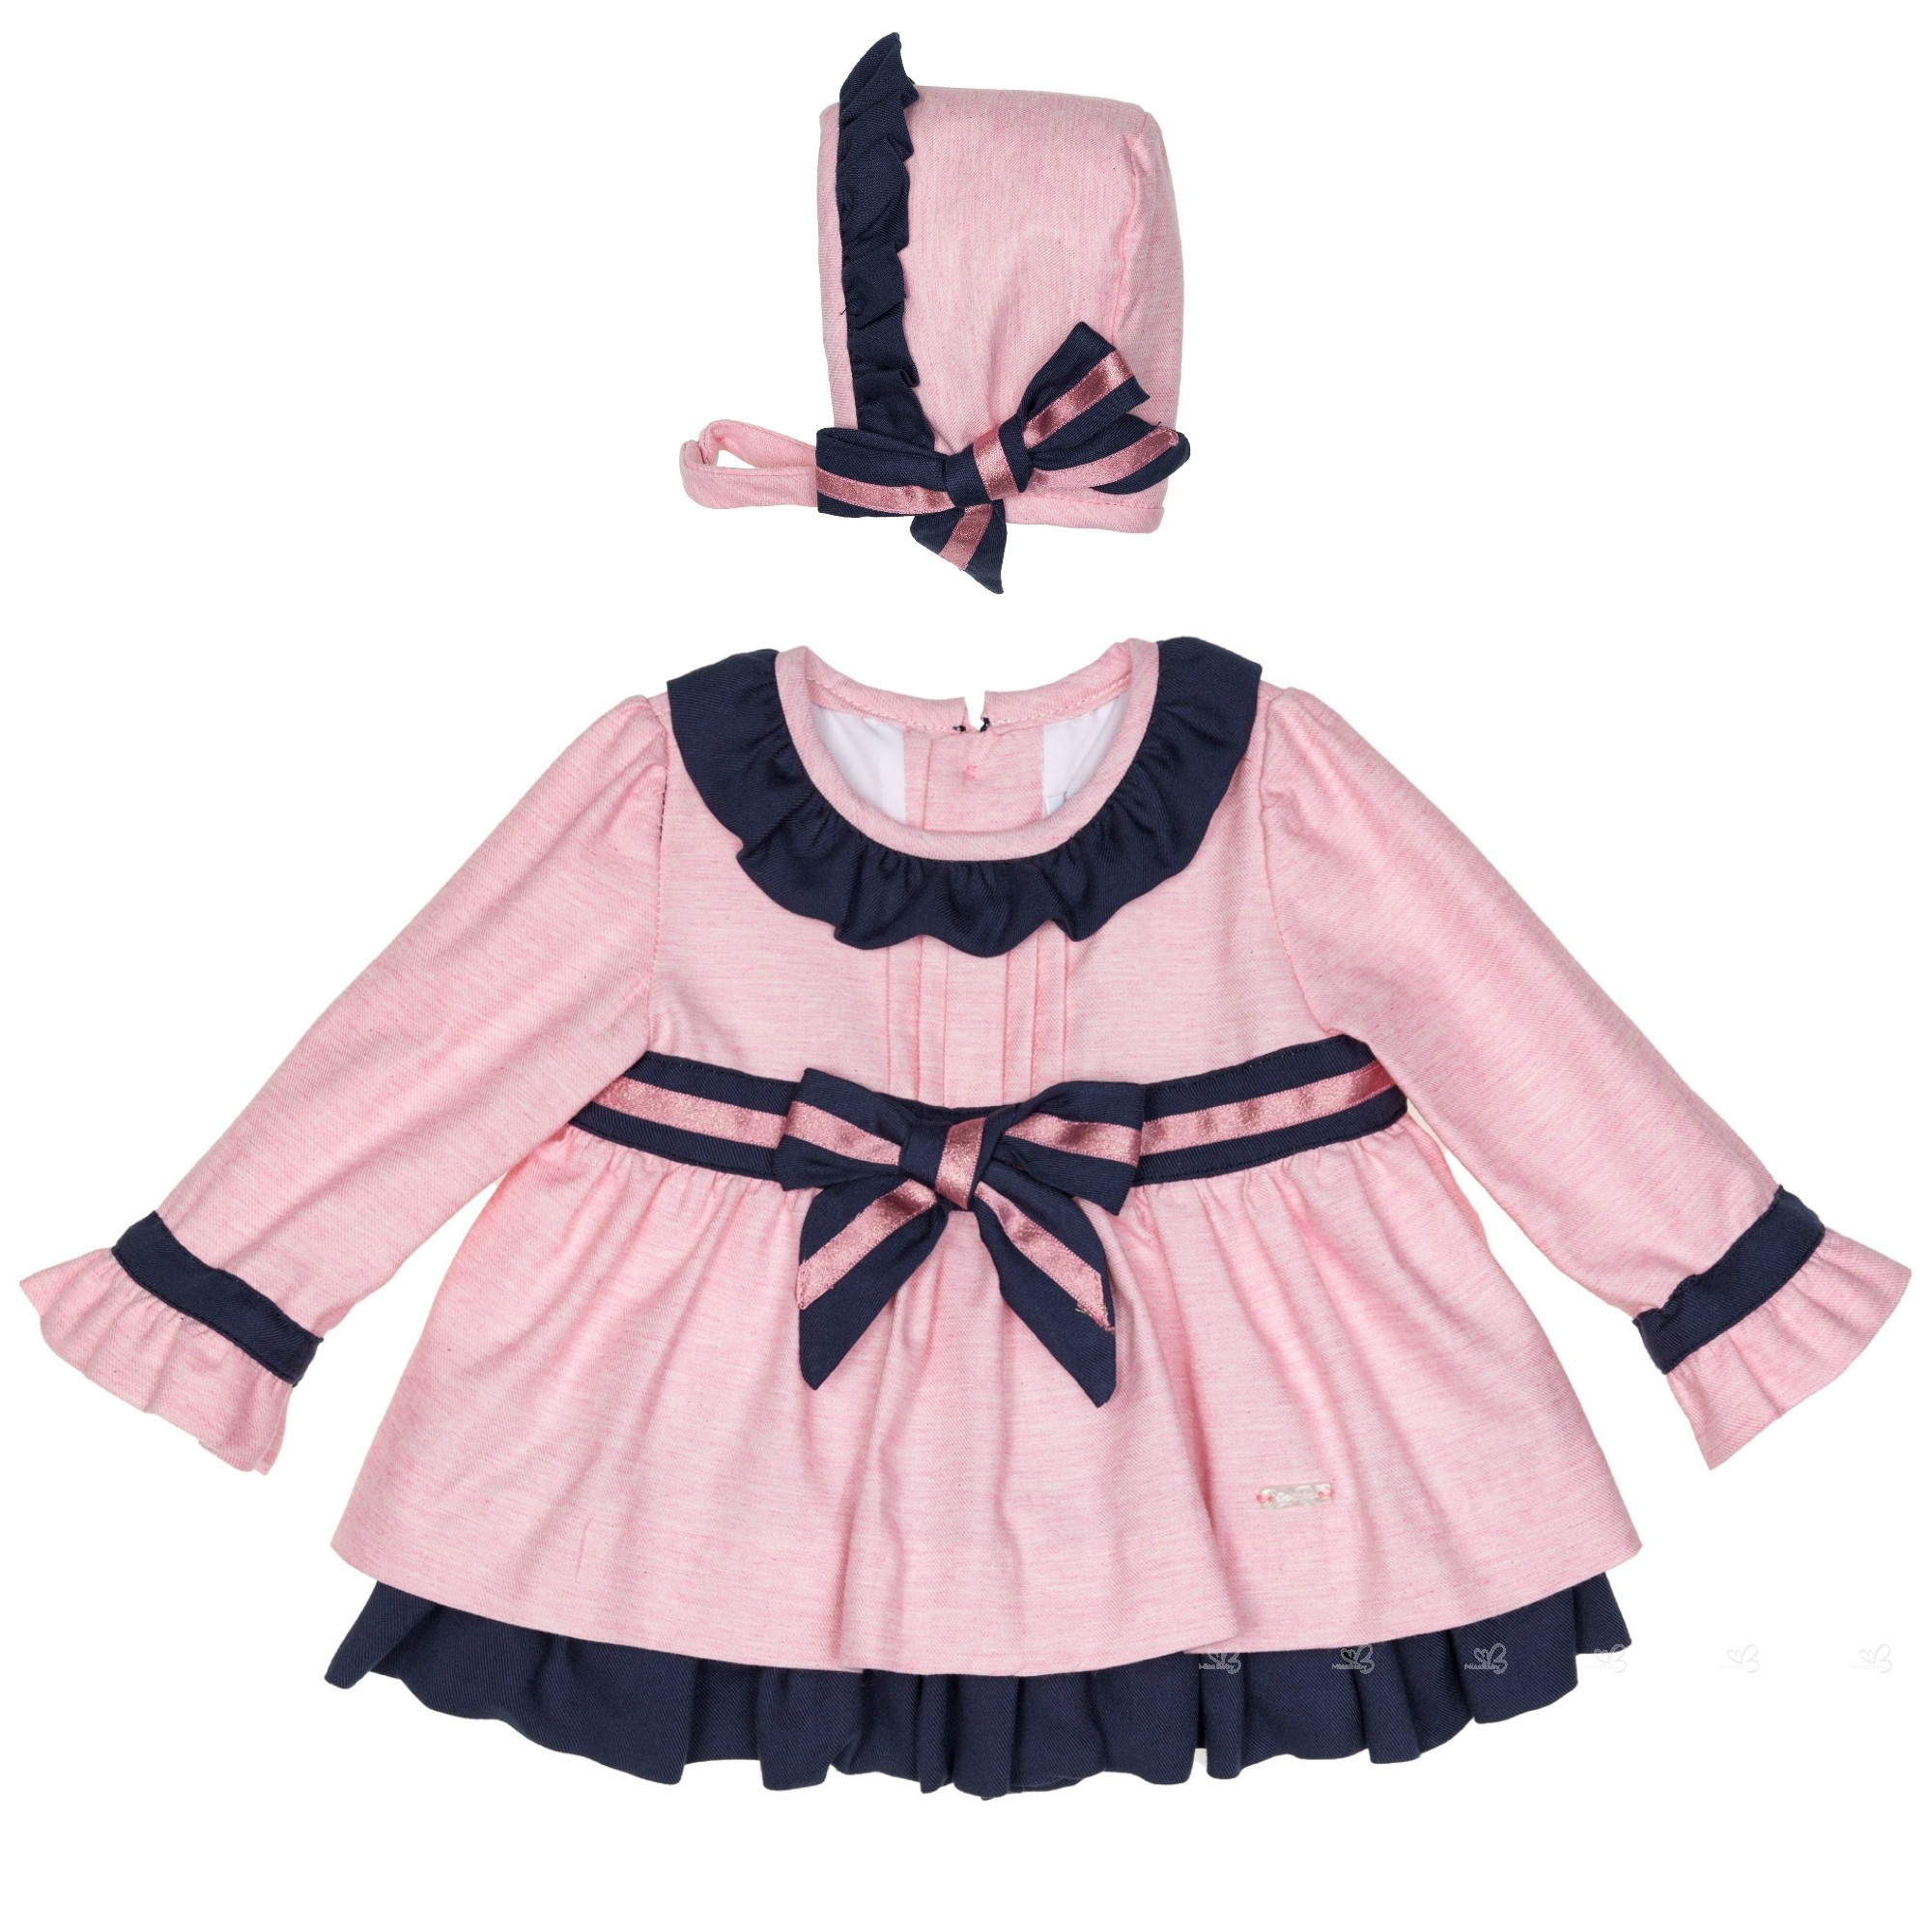 Baby Girls Pink & Navy Blue Dress Set